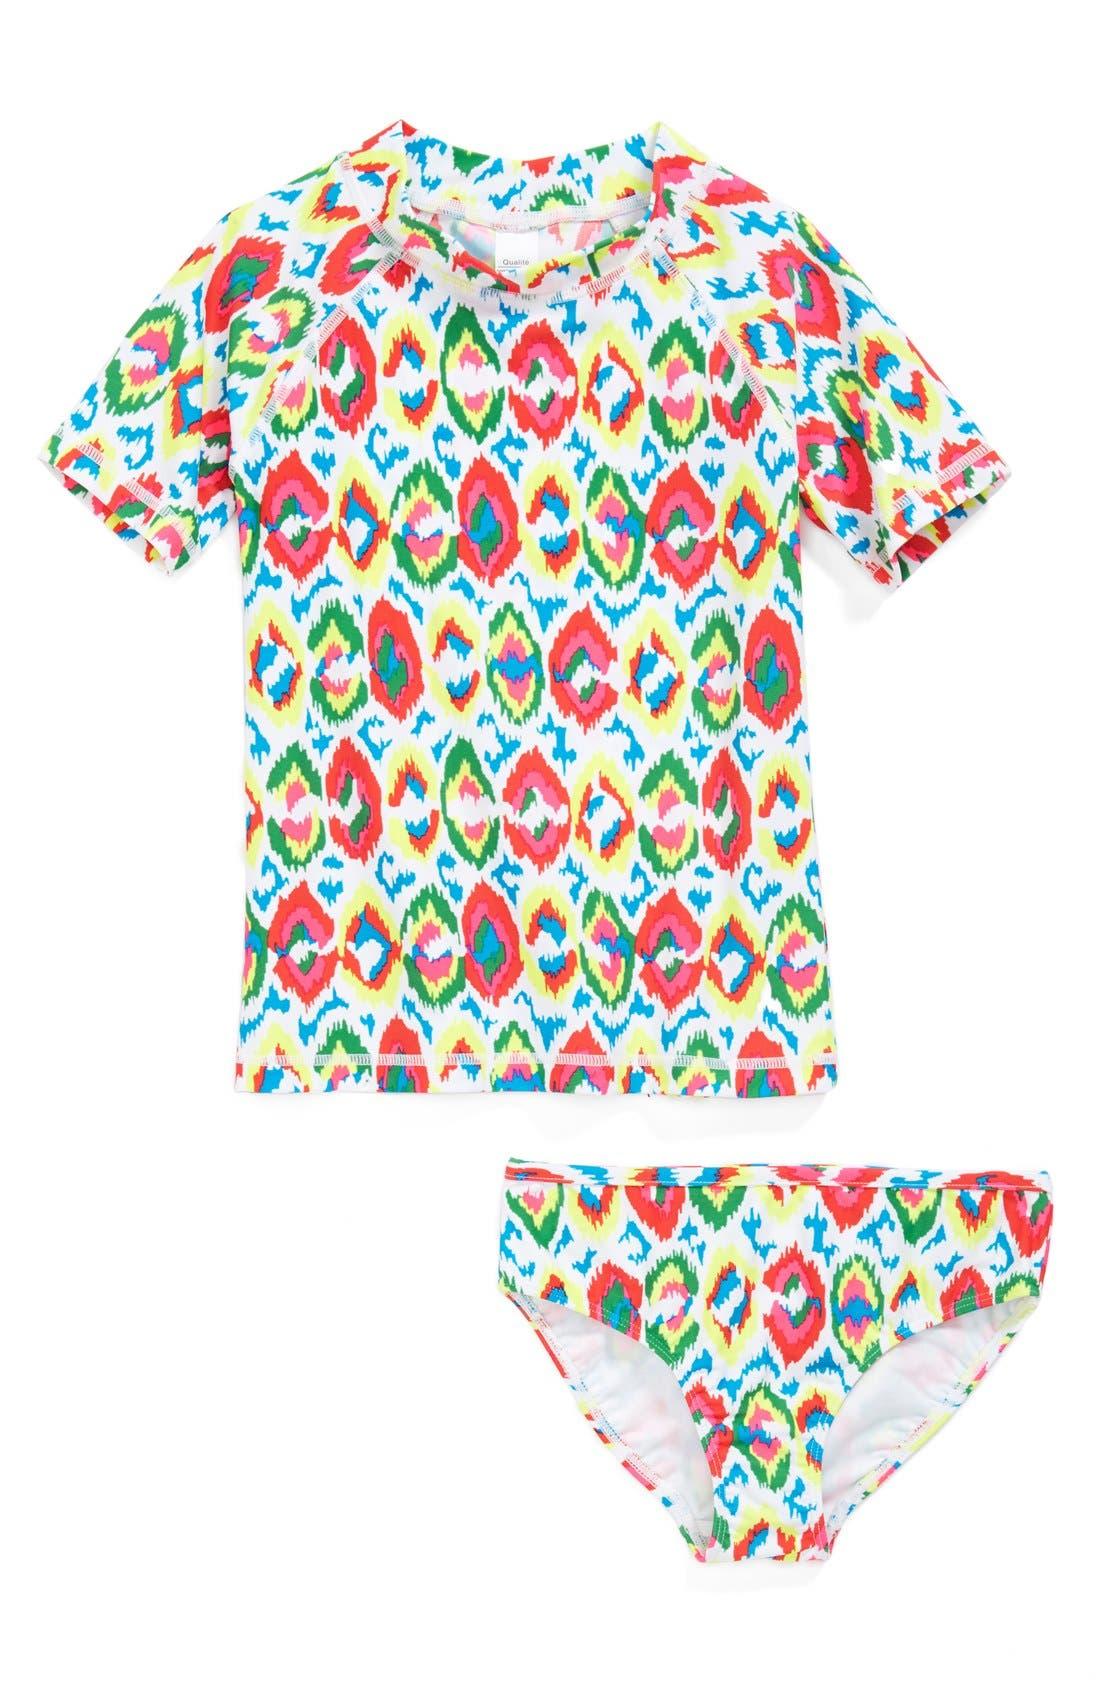 Alternate Image 1 Selected - Tucker + Tate Rashguard Shirt & Bottoms (Toddler Girls)